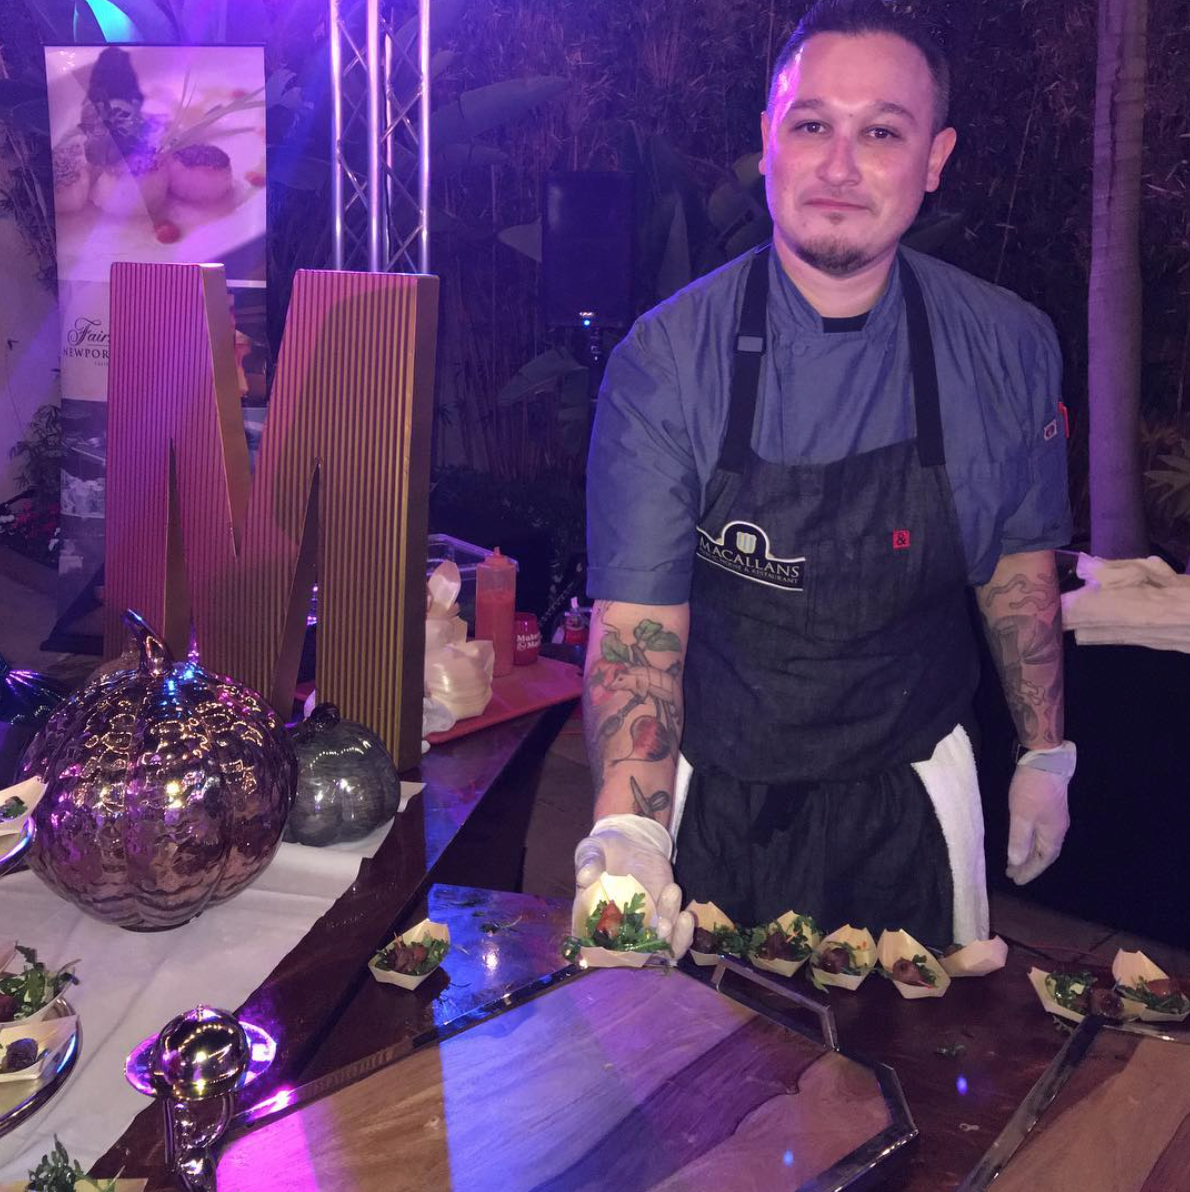 Chef Roman Jimenez | Photo courtesy of @MacallansPub via Instagram